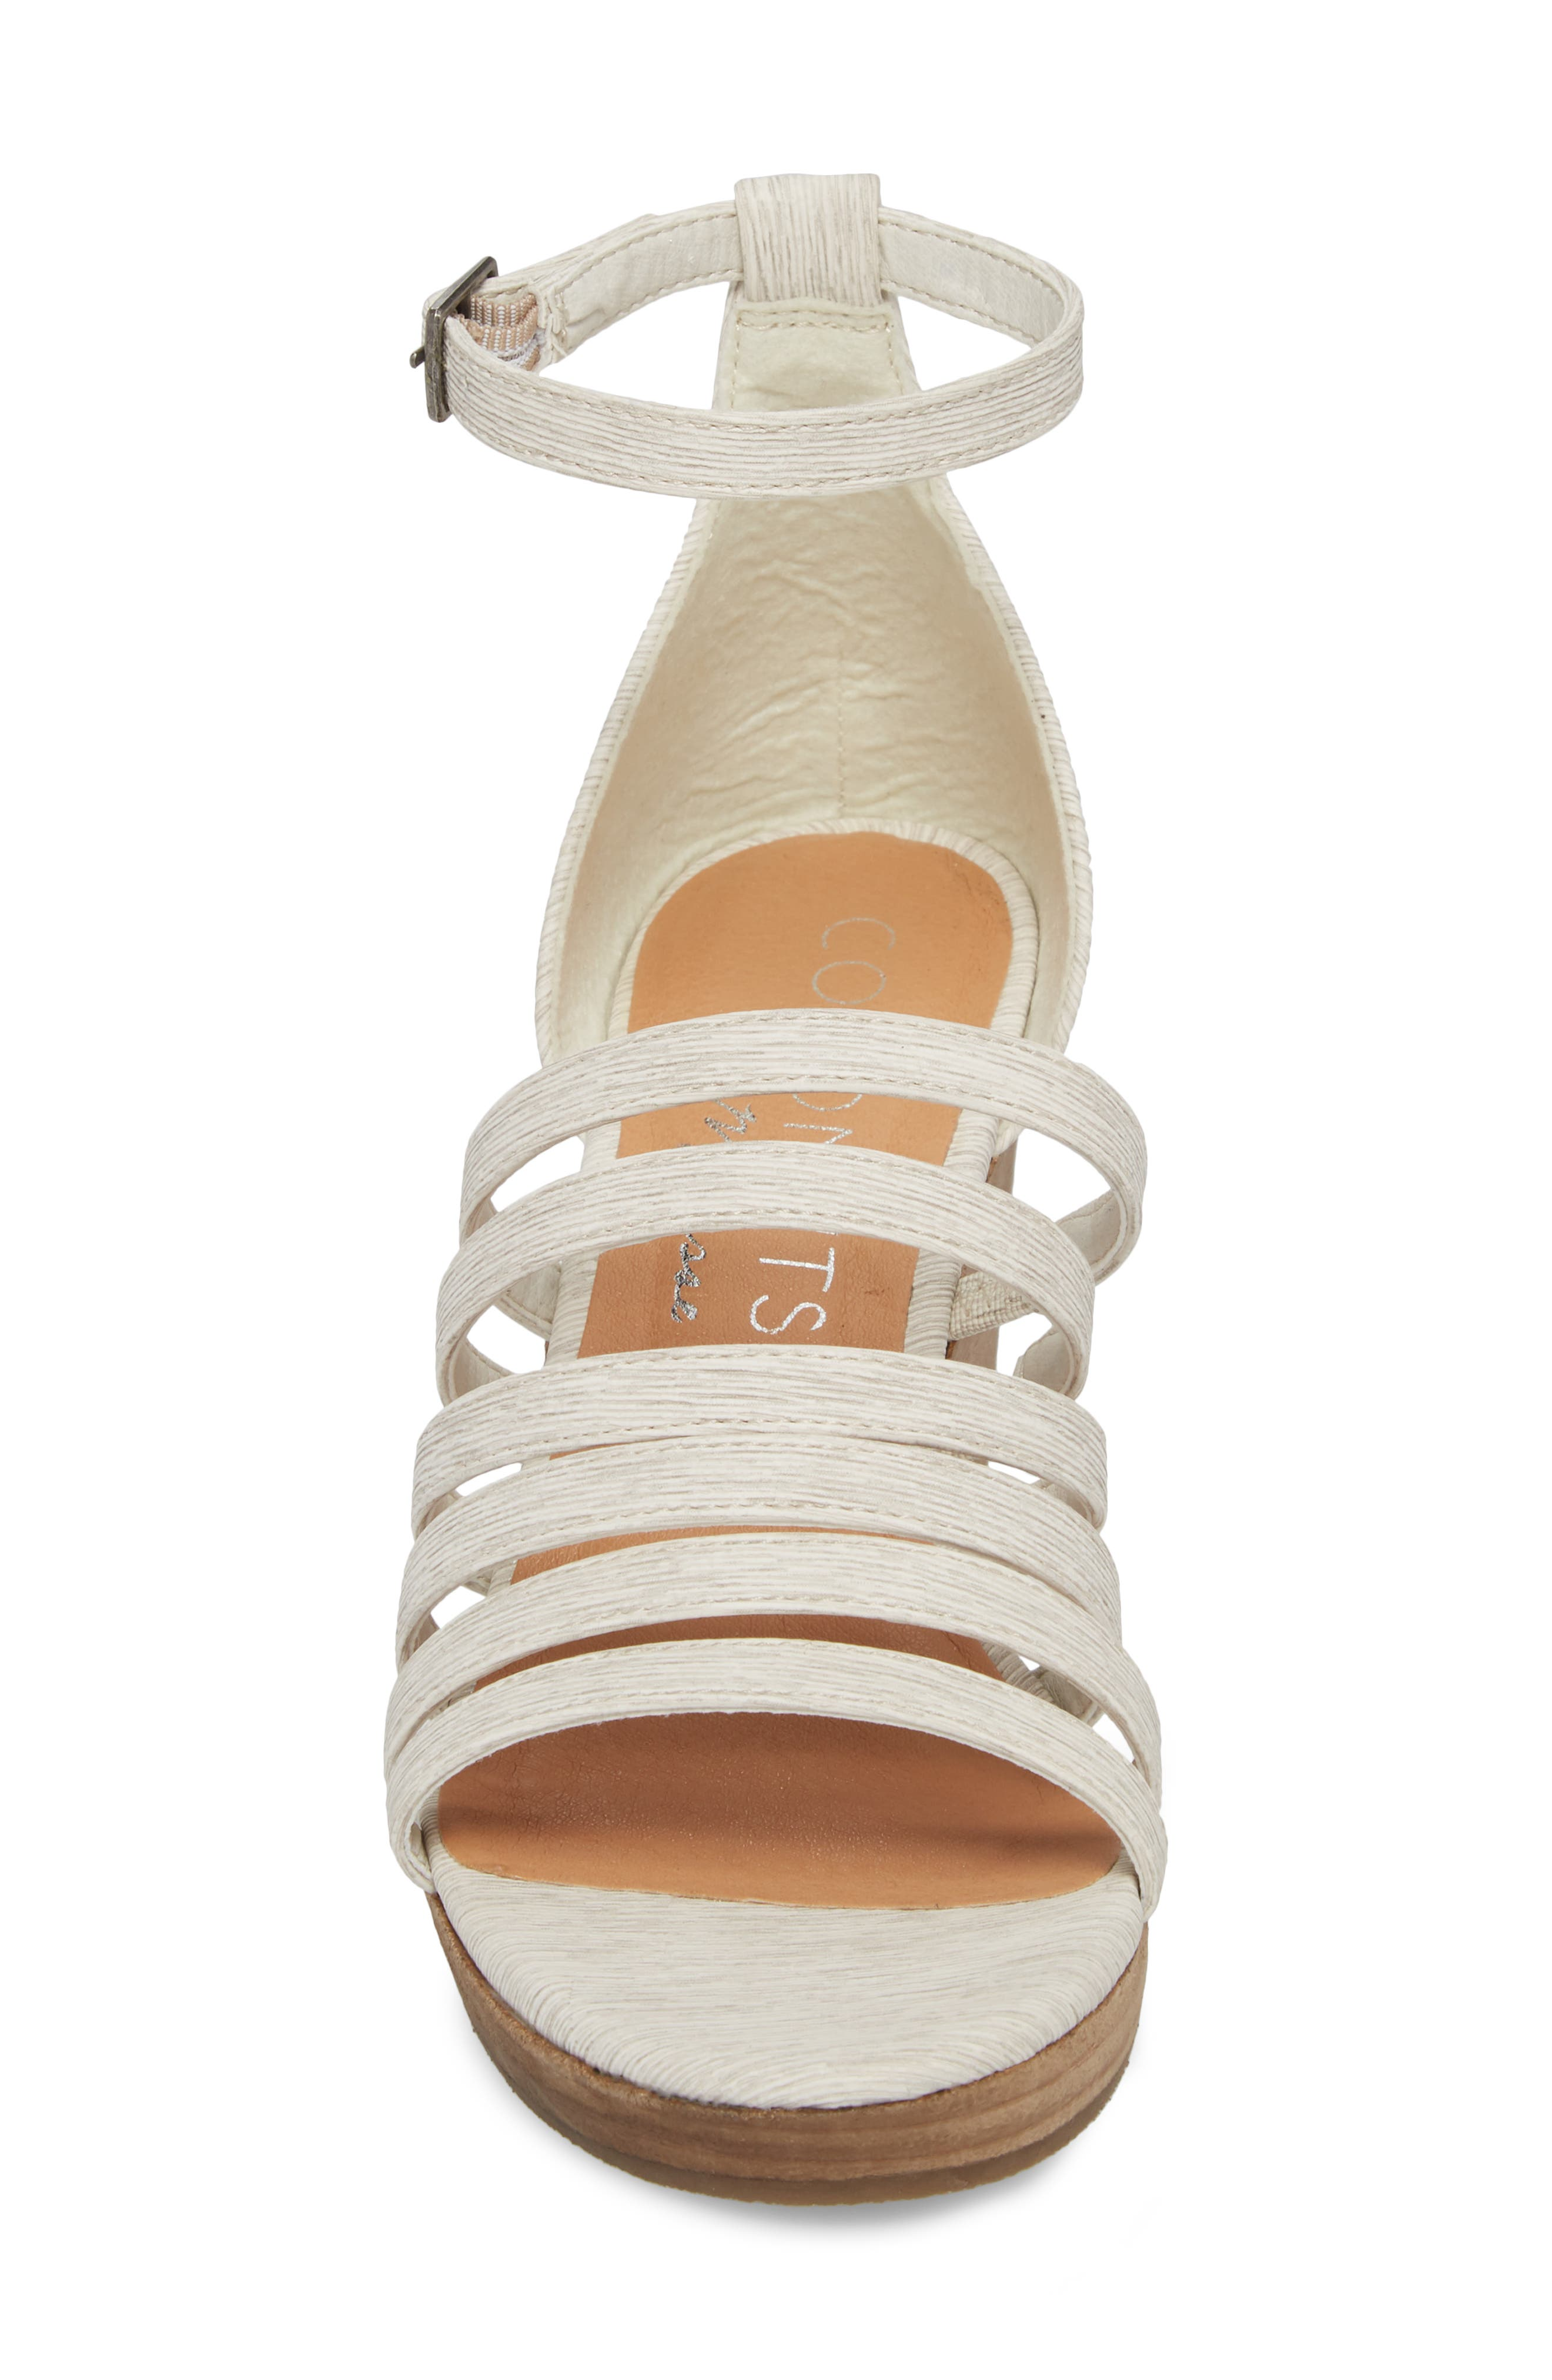 Kiera Wedge Sandal,                             Alternate thumbnail 4, color,                             NATURAL FABRIC